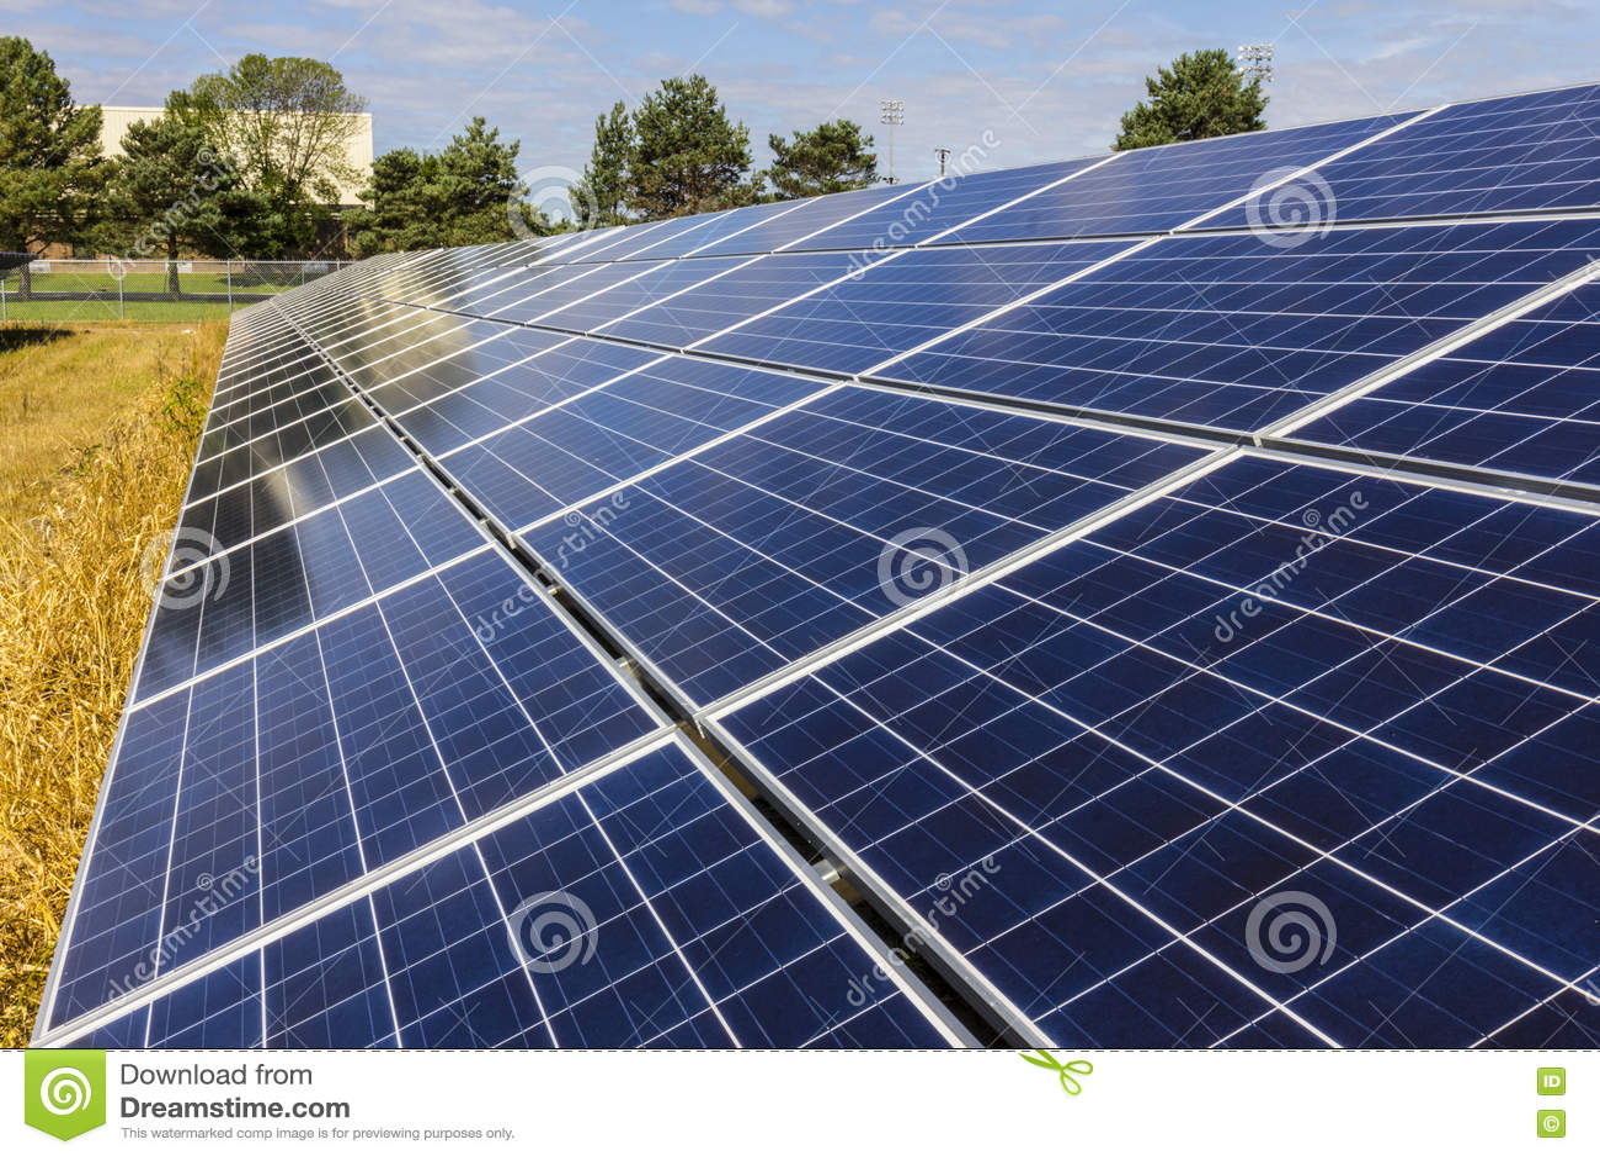 Solar Panel Energy Collector Farm Royalty Free Stock Image